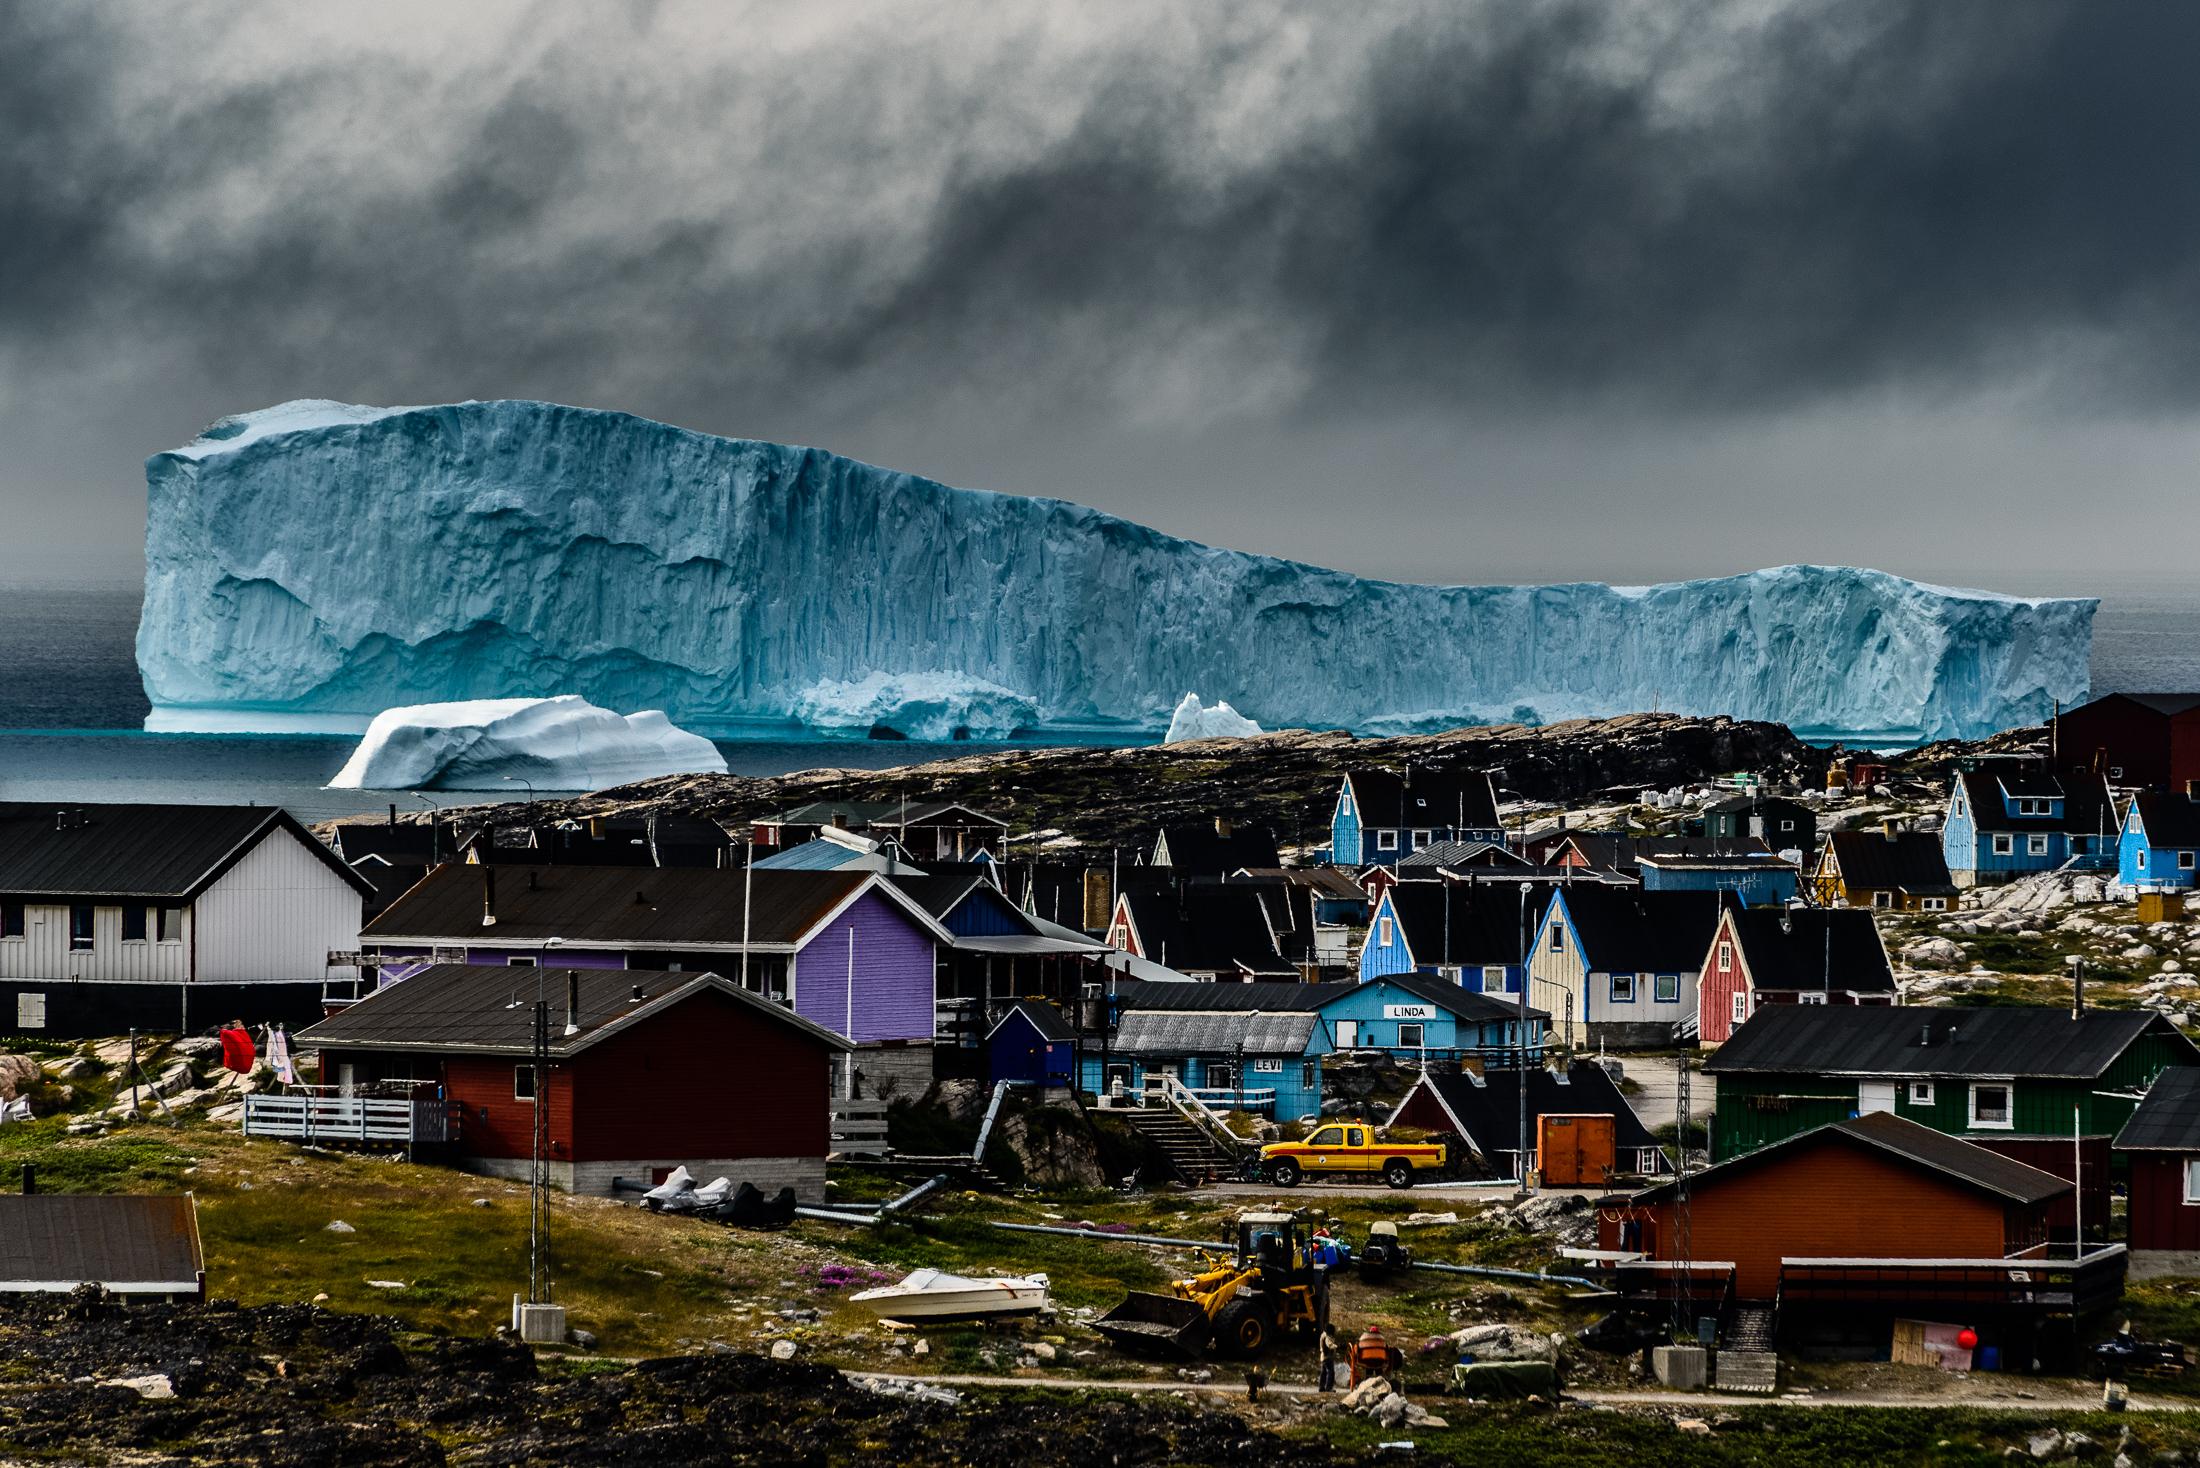 Massive Iceberg Looming Over Qeqertarsuaq